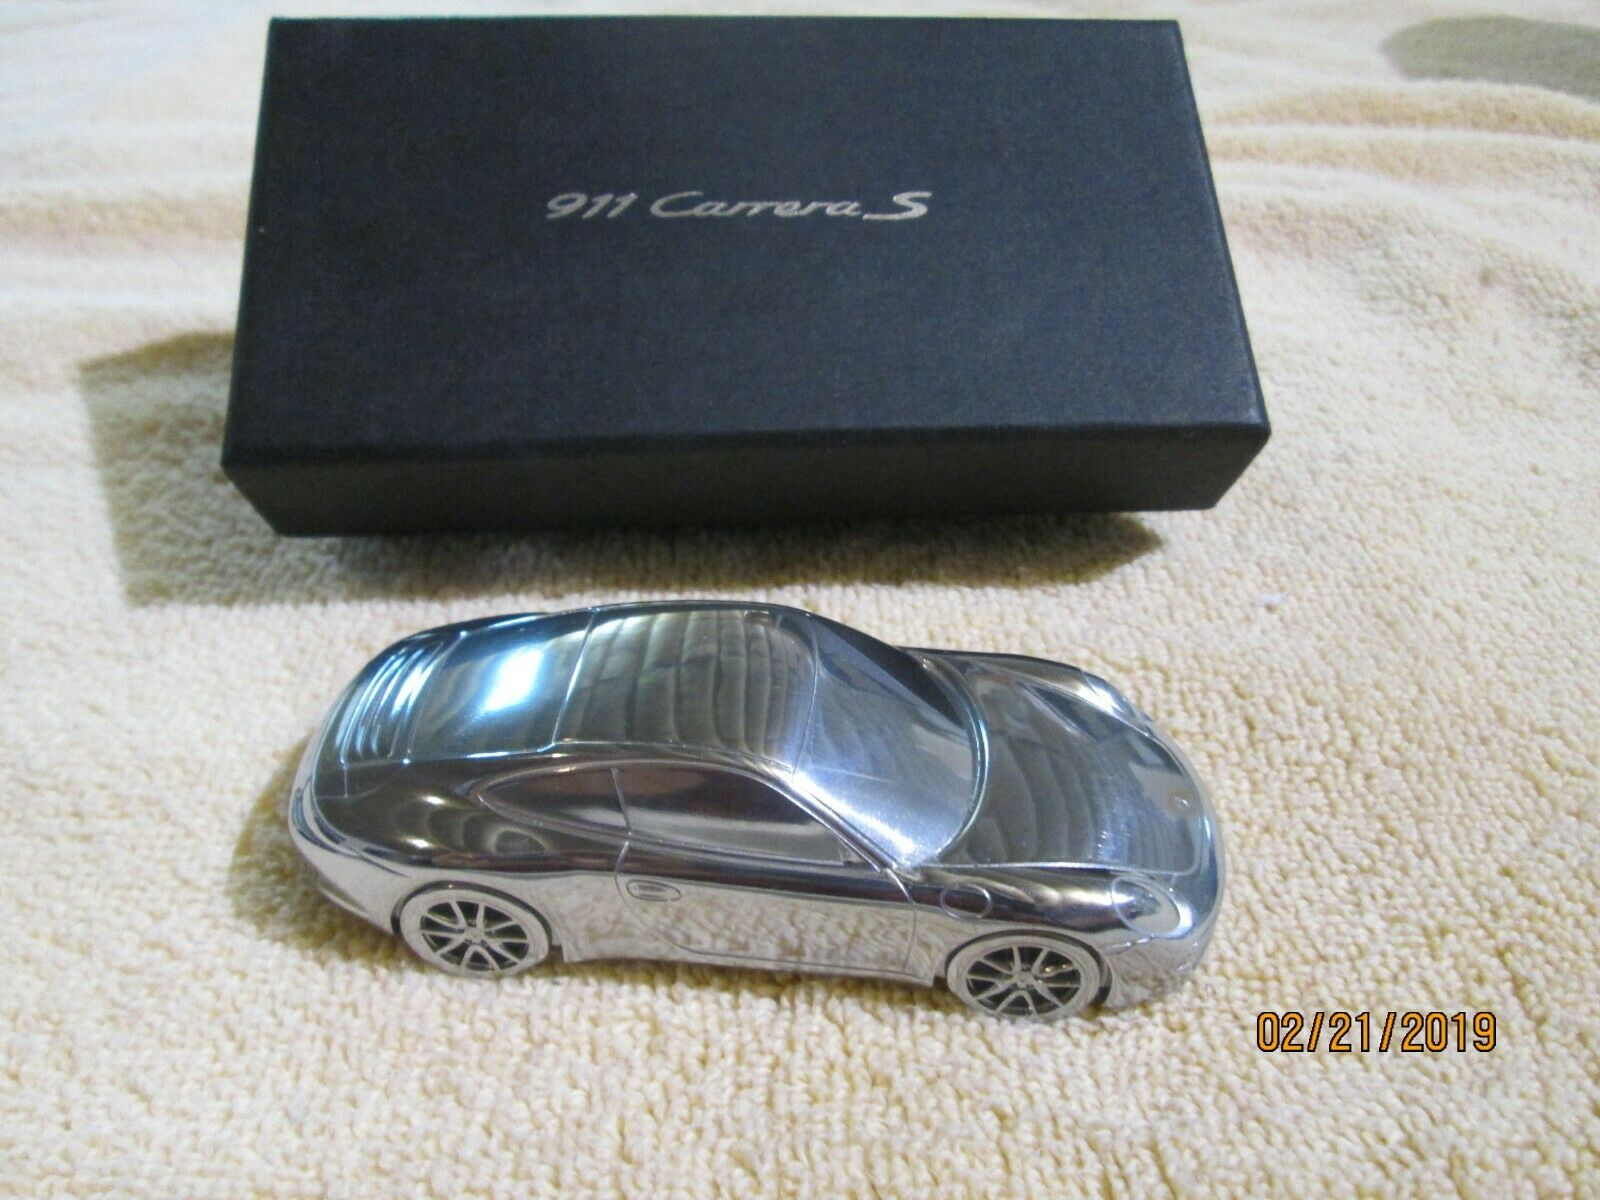 PORSCHE 911 voiturerera S Limited Edition  Model Aluminum paperweight  est réduit